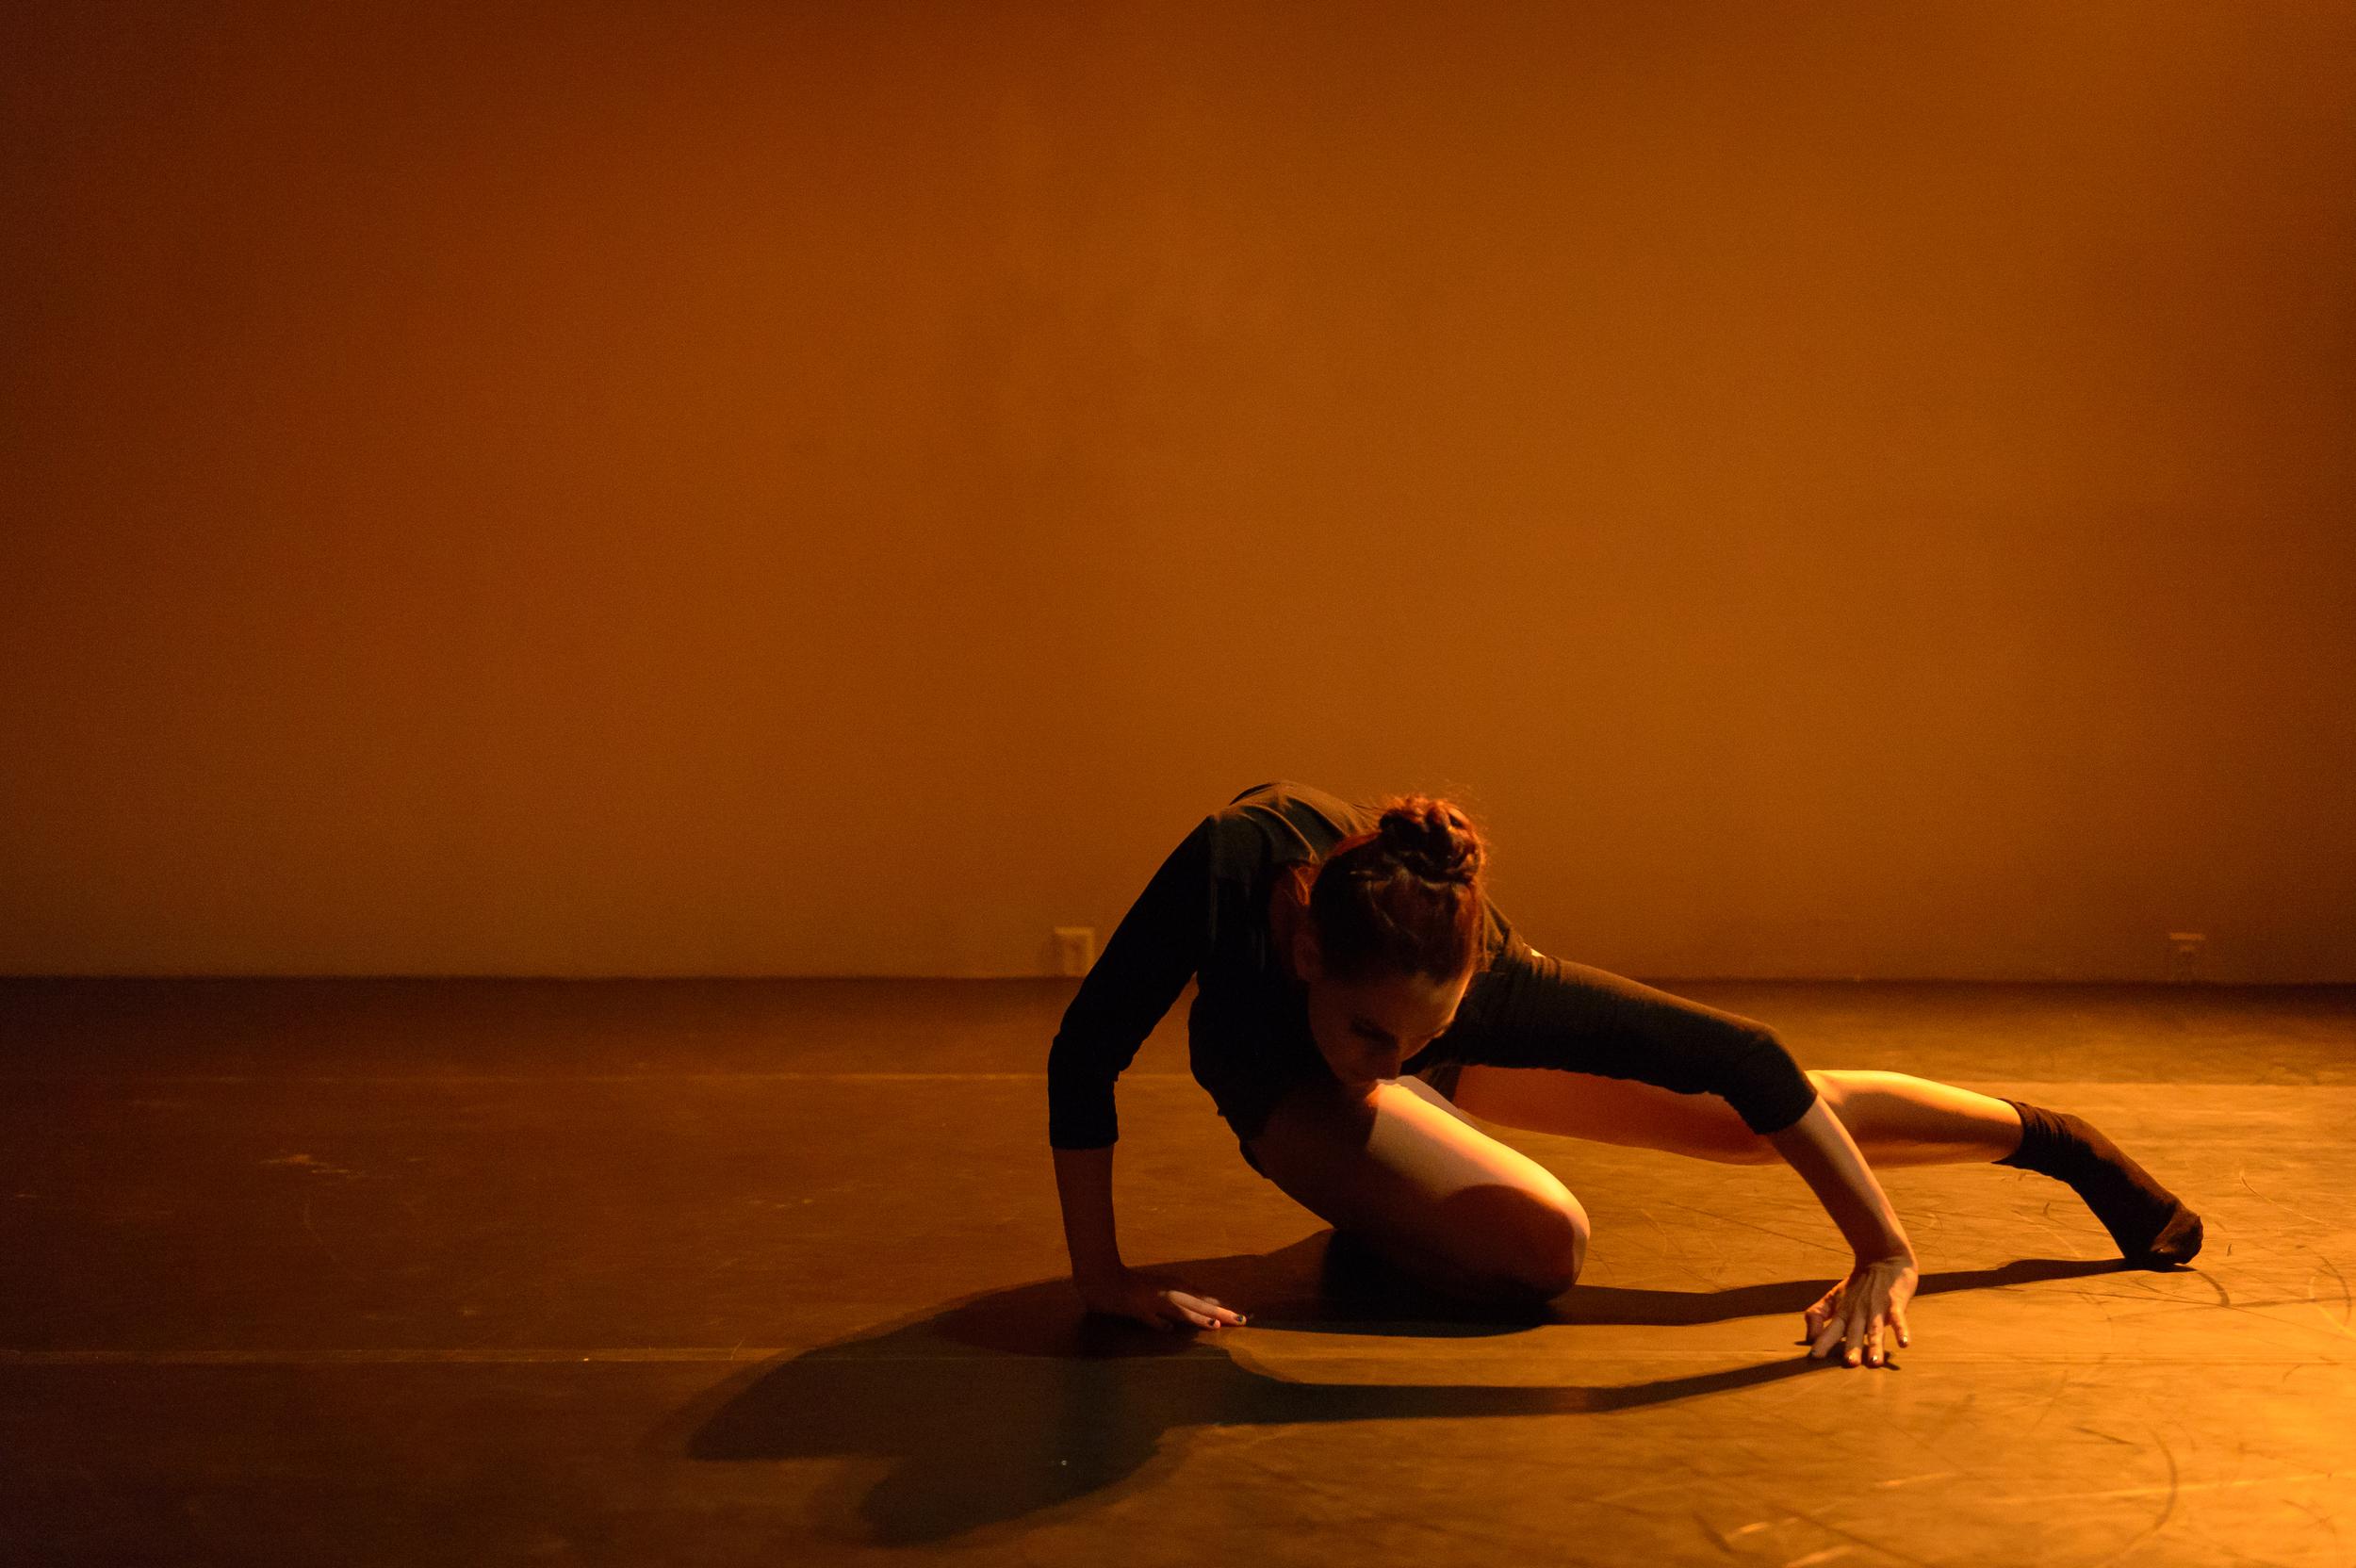 Allison Jones Dance. August 2014. Photo: Corey Melton.